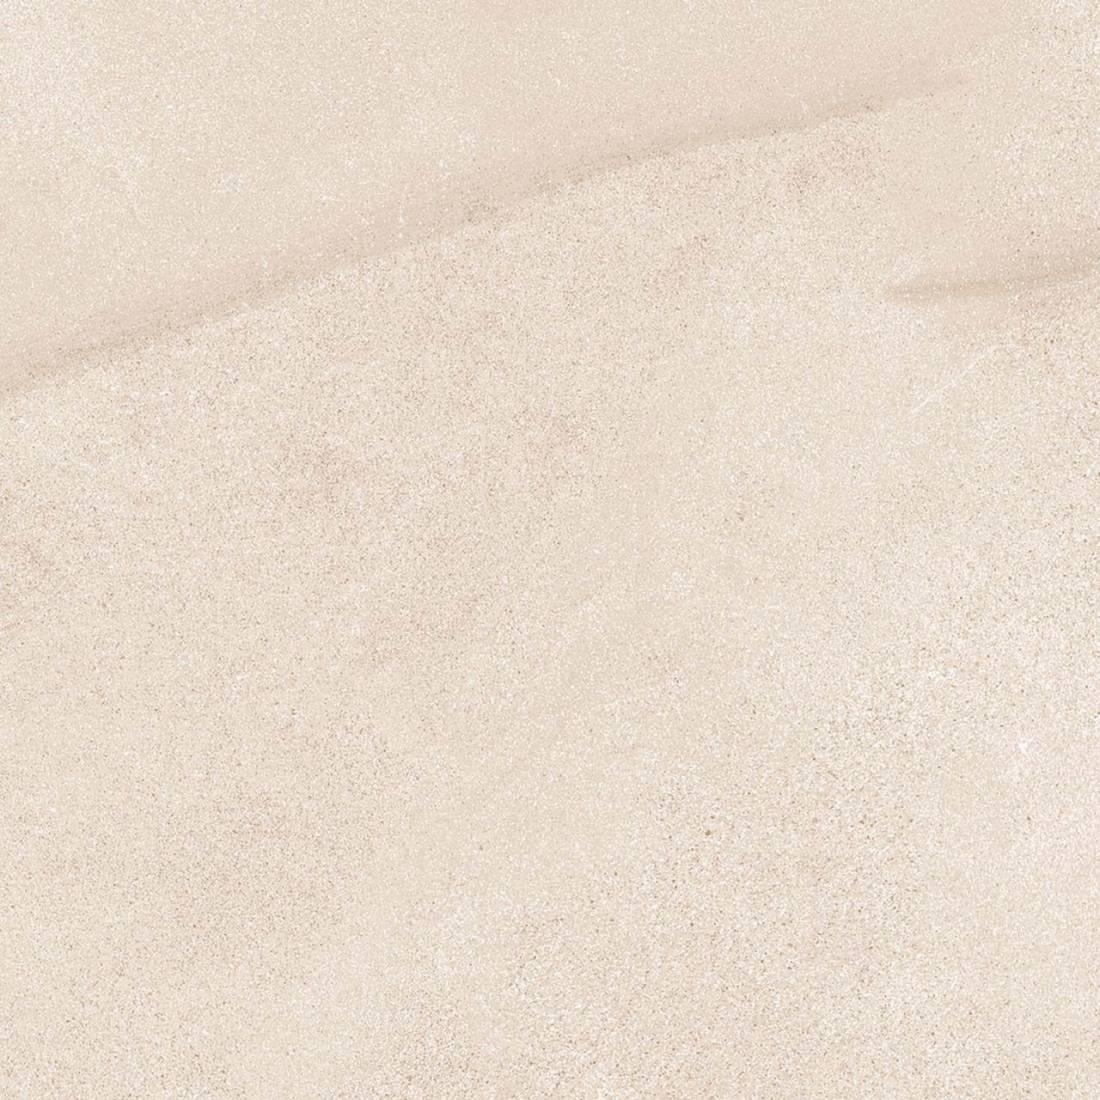 Quartzite 60x60 Crema Polished 1